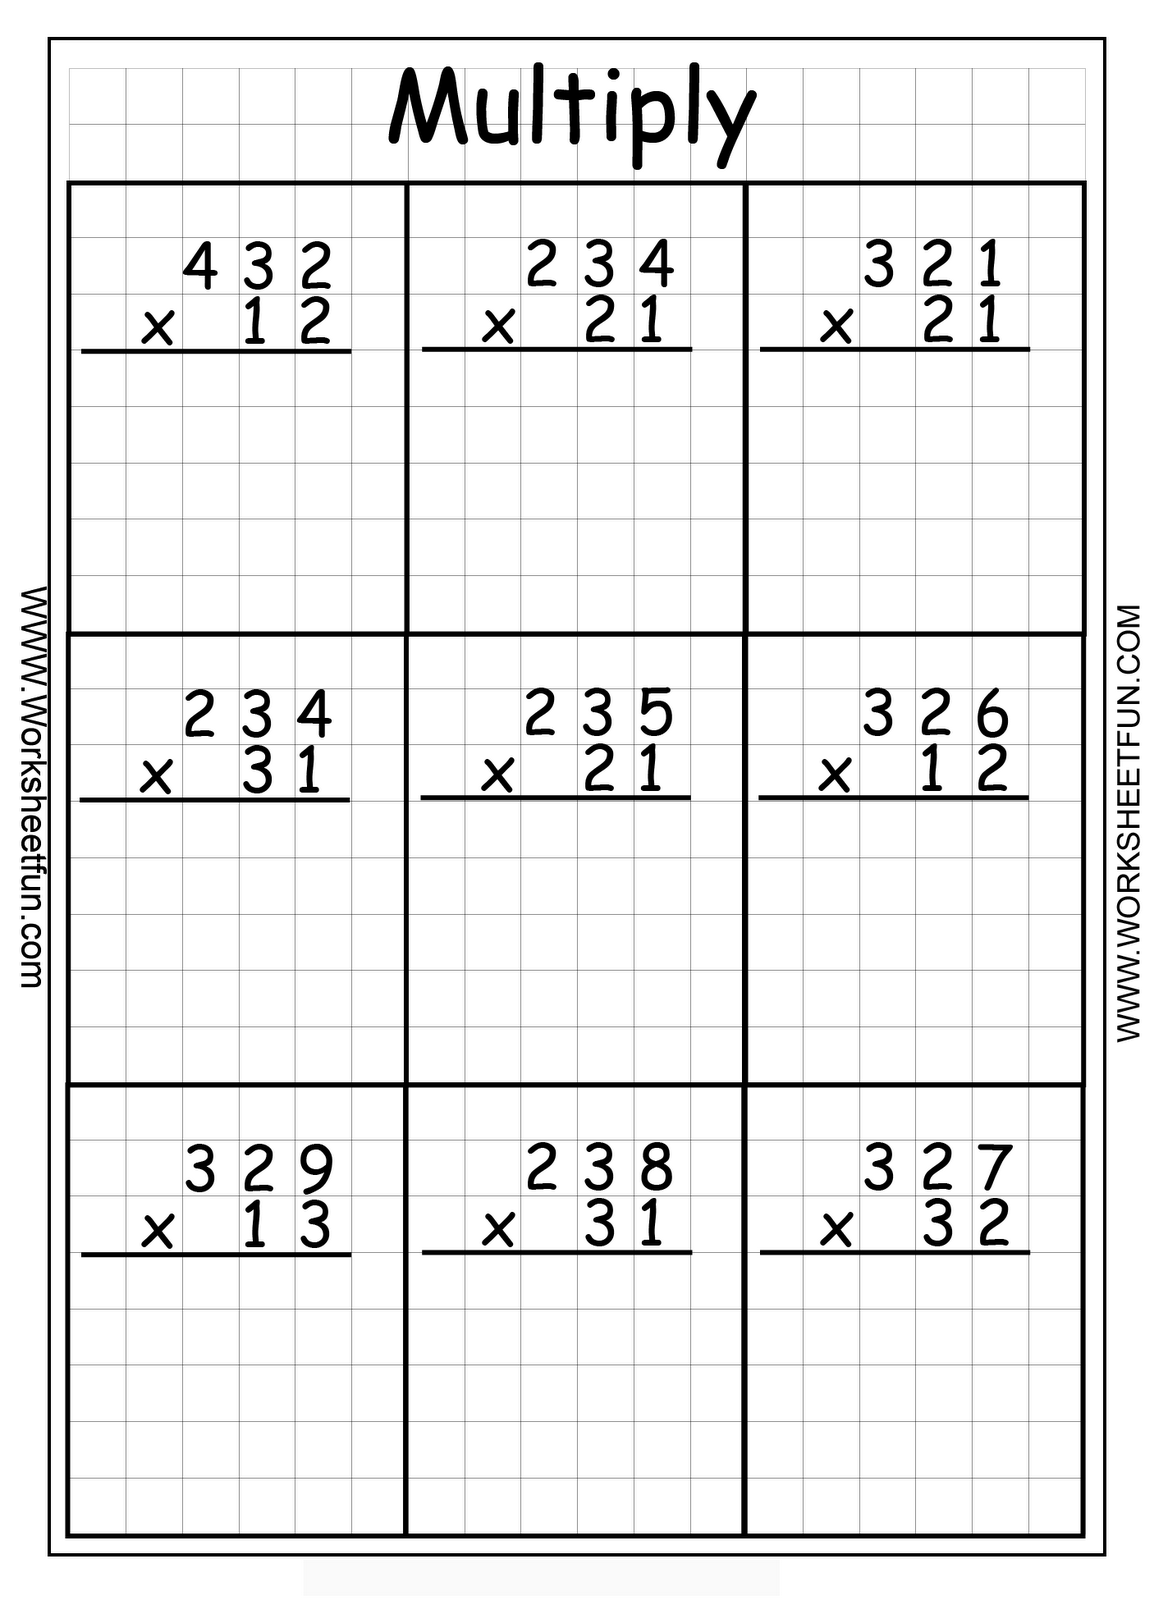 Worksheetfun - FREE PRINTABLE WORKSHEETS   4th grade math worksheets [ 1600 x 1154 Pixel ]